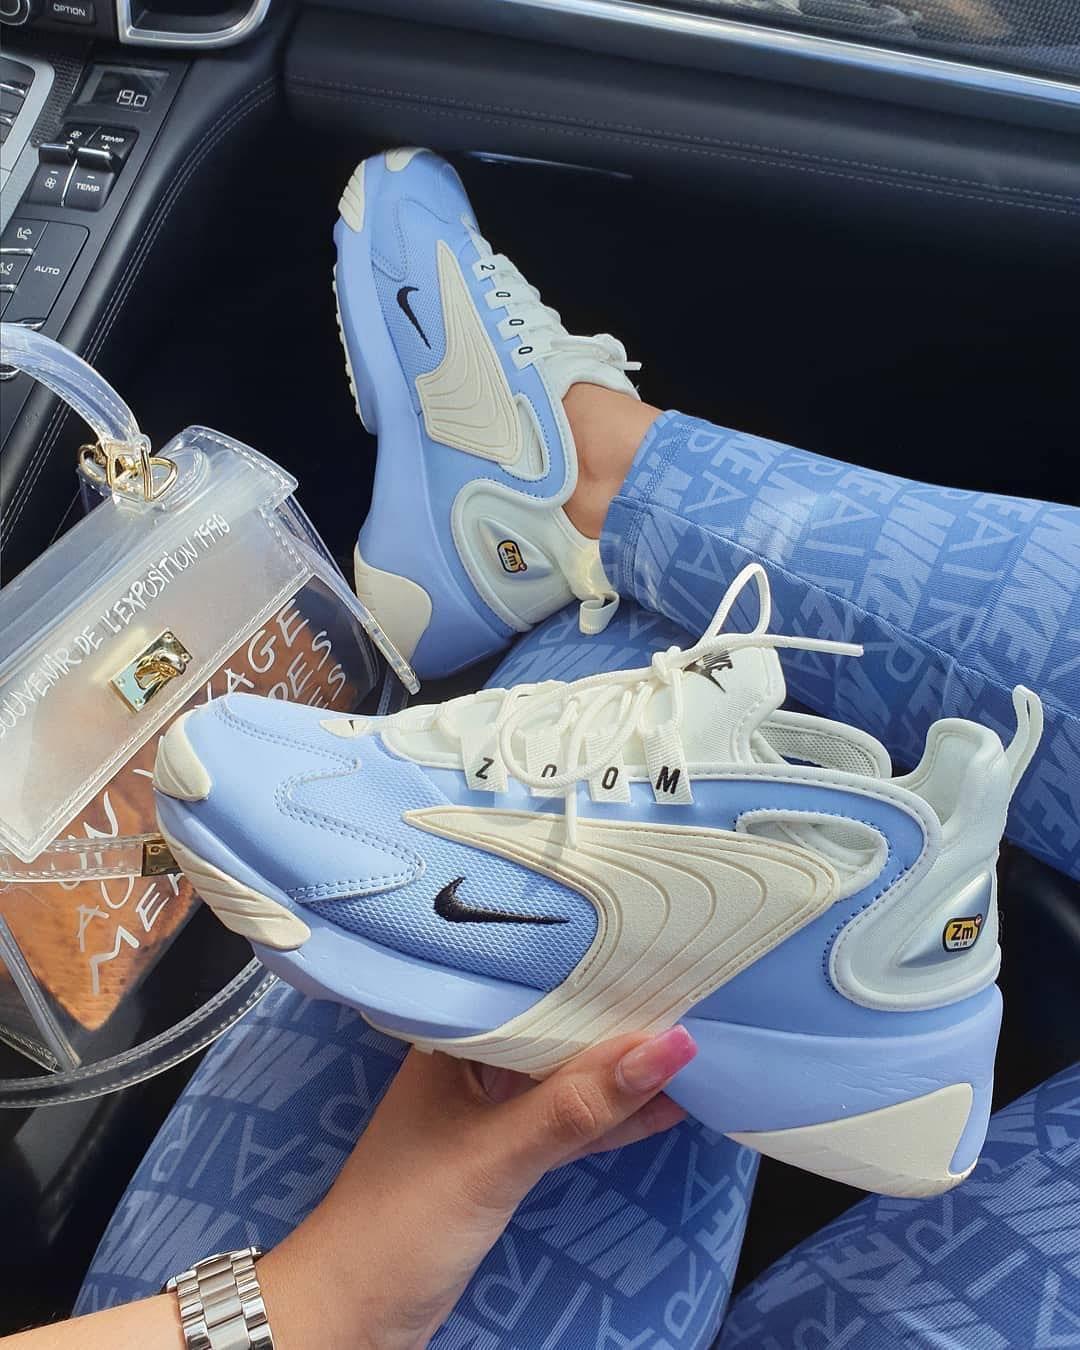 Nike Zoom 2K • @flaaviajardim • Follow @babesnsneakers for more • #nikezoom #n…-#* #basementapproved #crepecity #hskicks #hypebae #hypebaekicks #hypefeet #hypelife #klekttakeover #marloparis #Nike #nikewomen #nikezoom #nikezoom2k #sneakersaddict #snkraddicted #trocsneakers #weartga #whatsurgirlwearing #wissk7